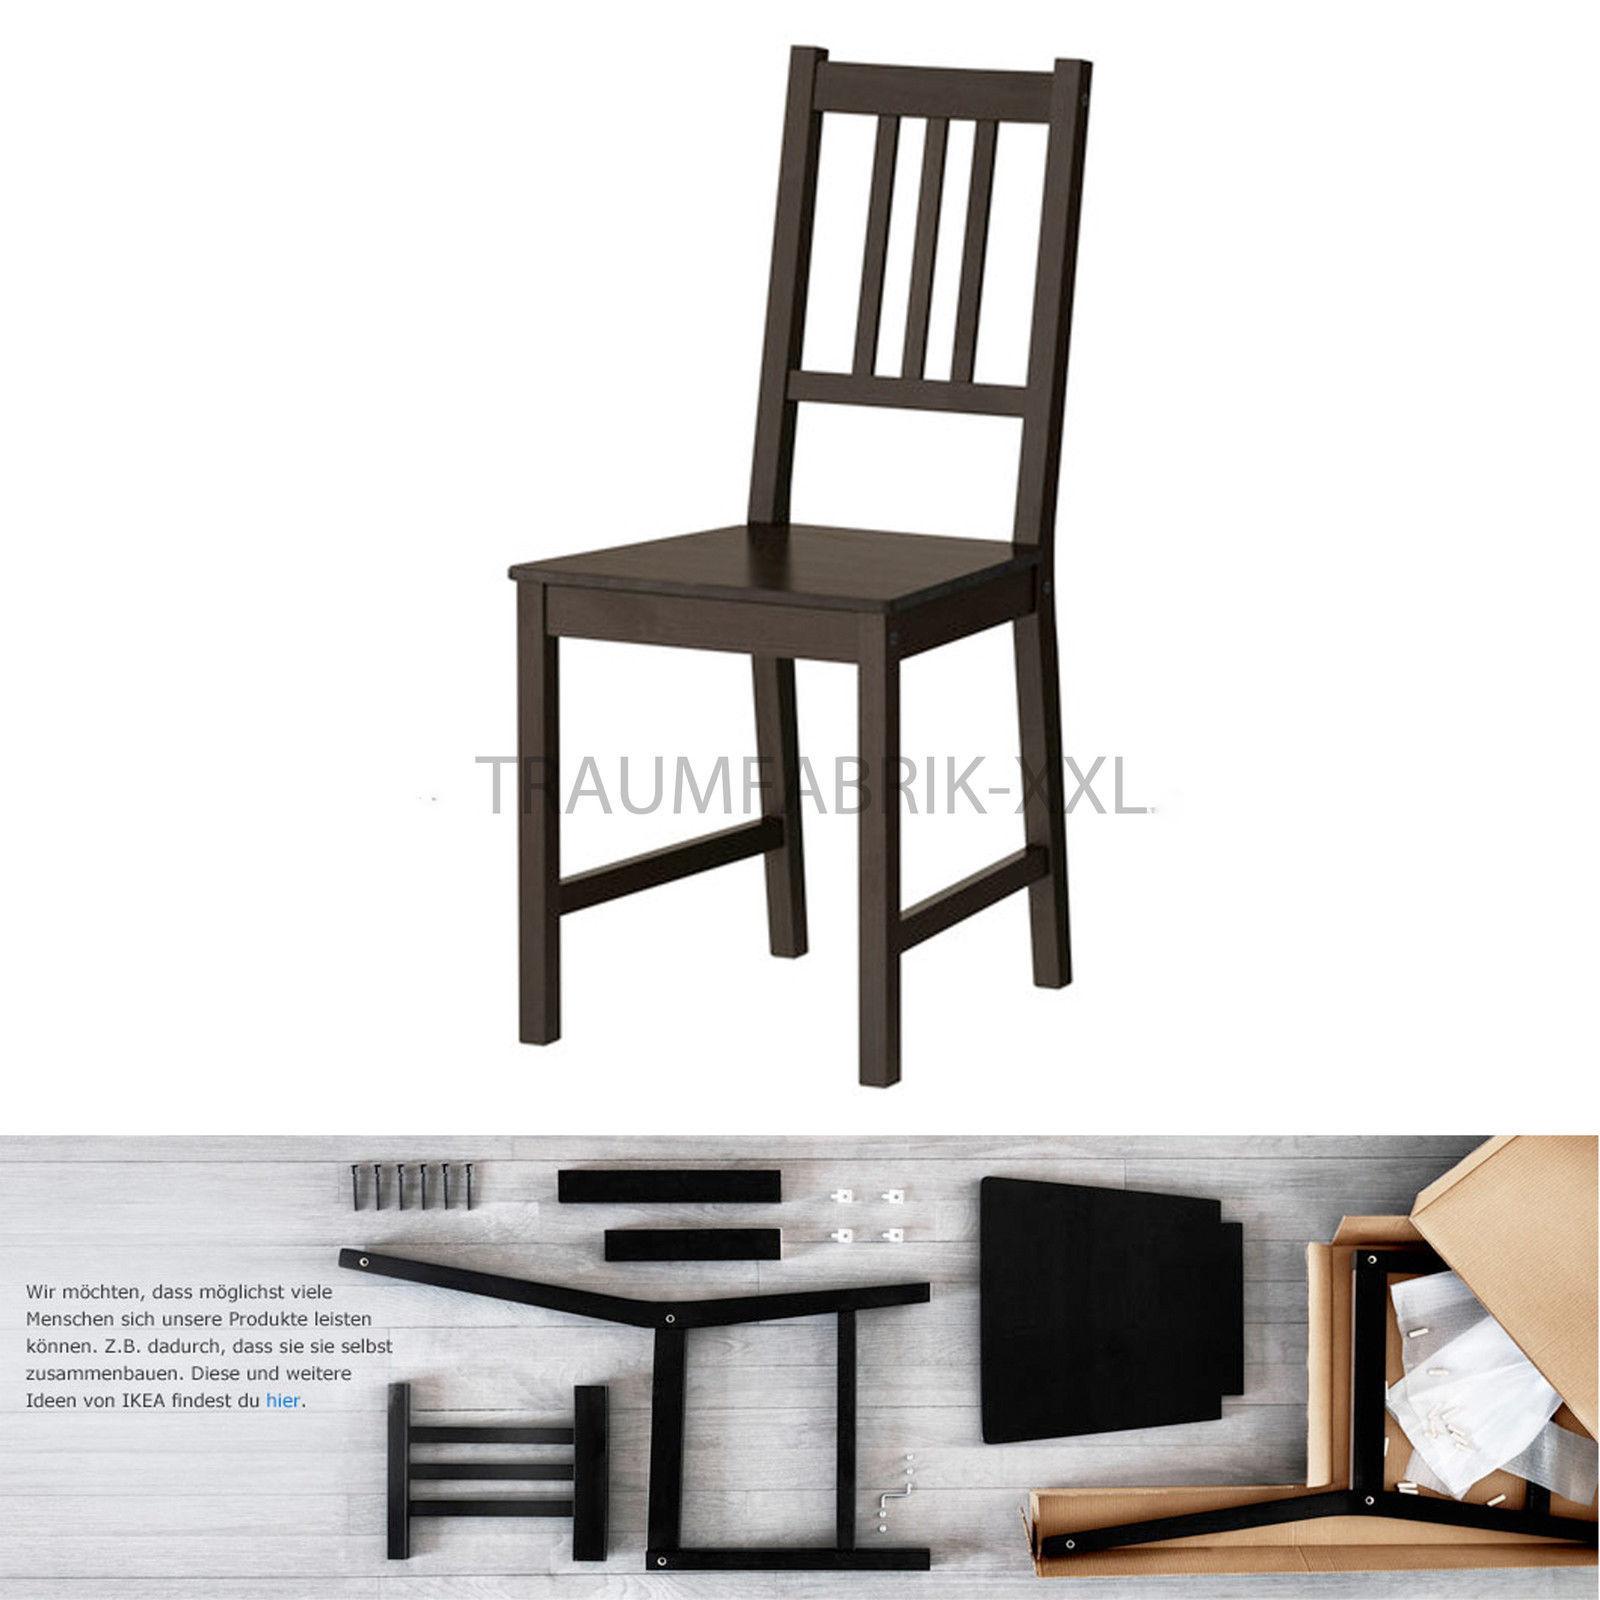 Kiefer Esszimmerstuhl Küchenstuhl Stuhl Braunschwarz Neu Ikea Stühle Holzstuhl 8Xn0wOPNk